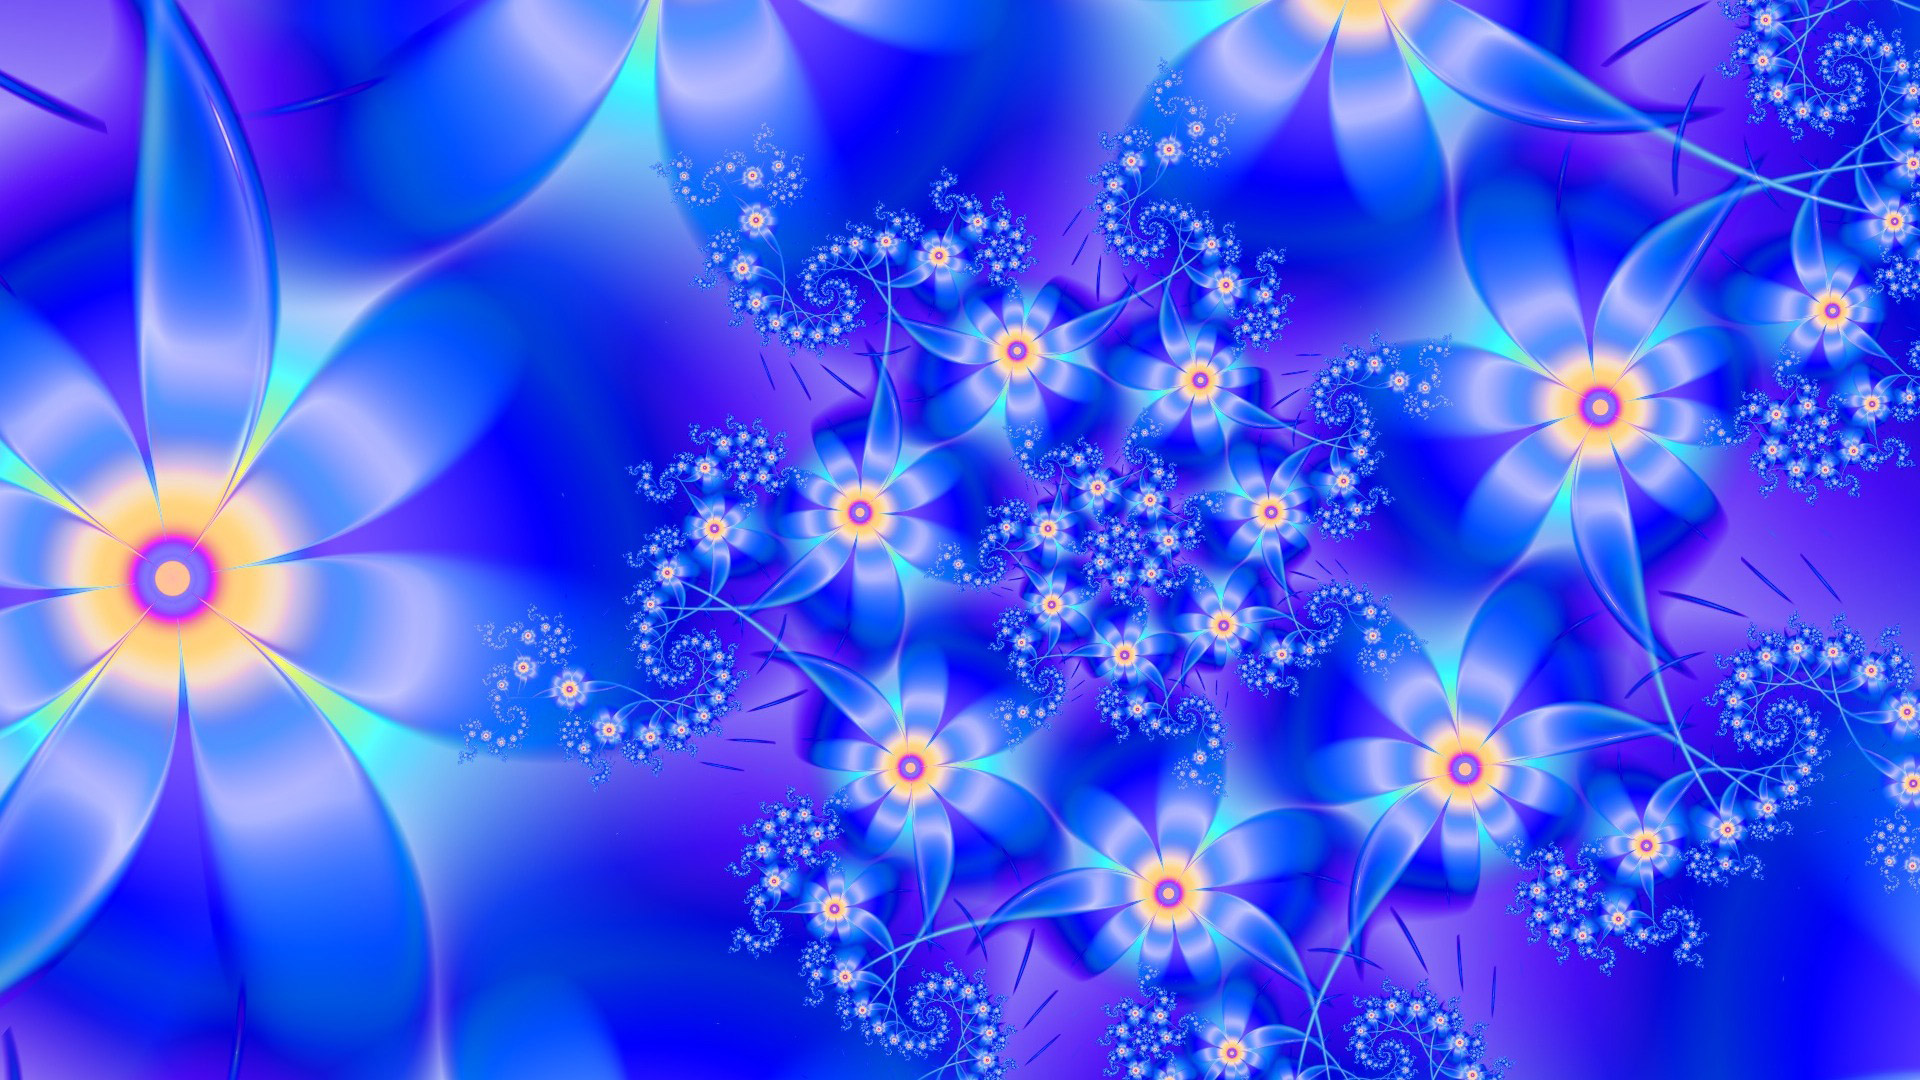 48 Abstract Flowers Wallpaper On Wallpapersafari